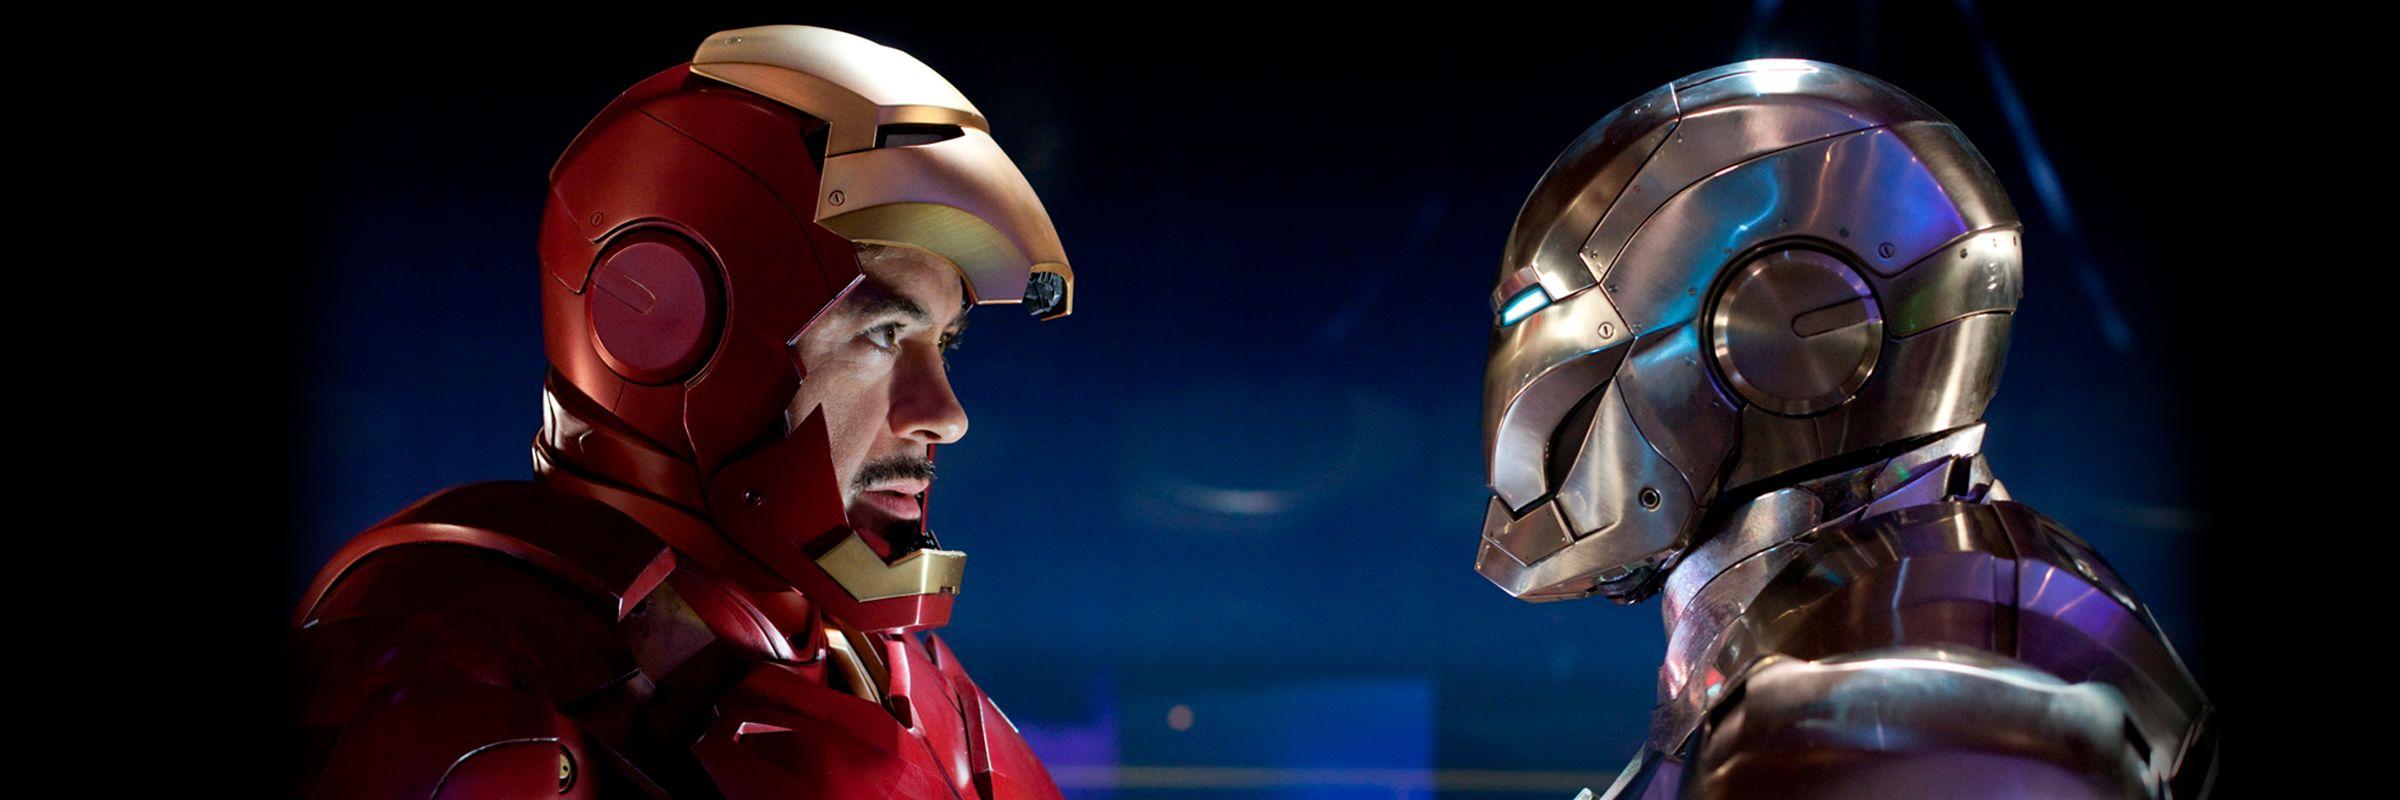 Marvel Studios' Iron Man 2 | Full Movie | Movies Anywhere